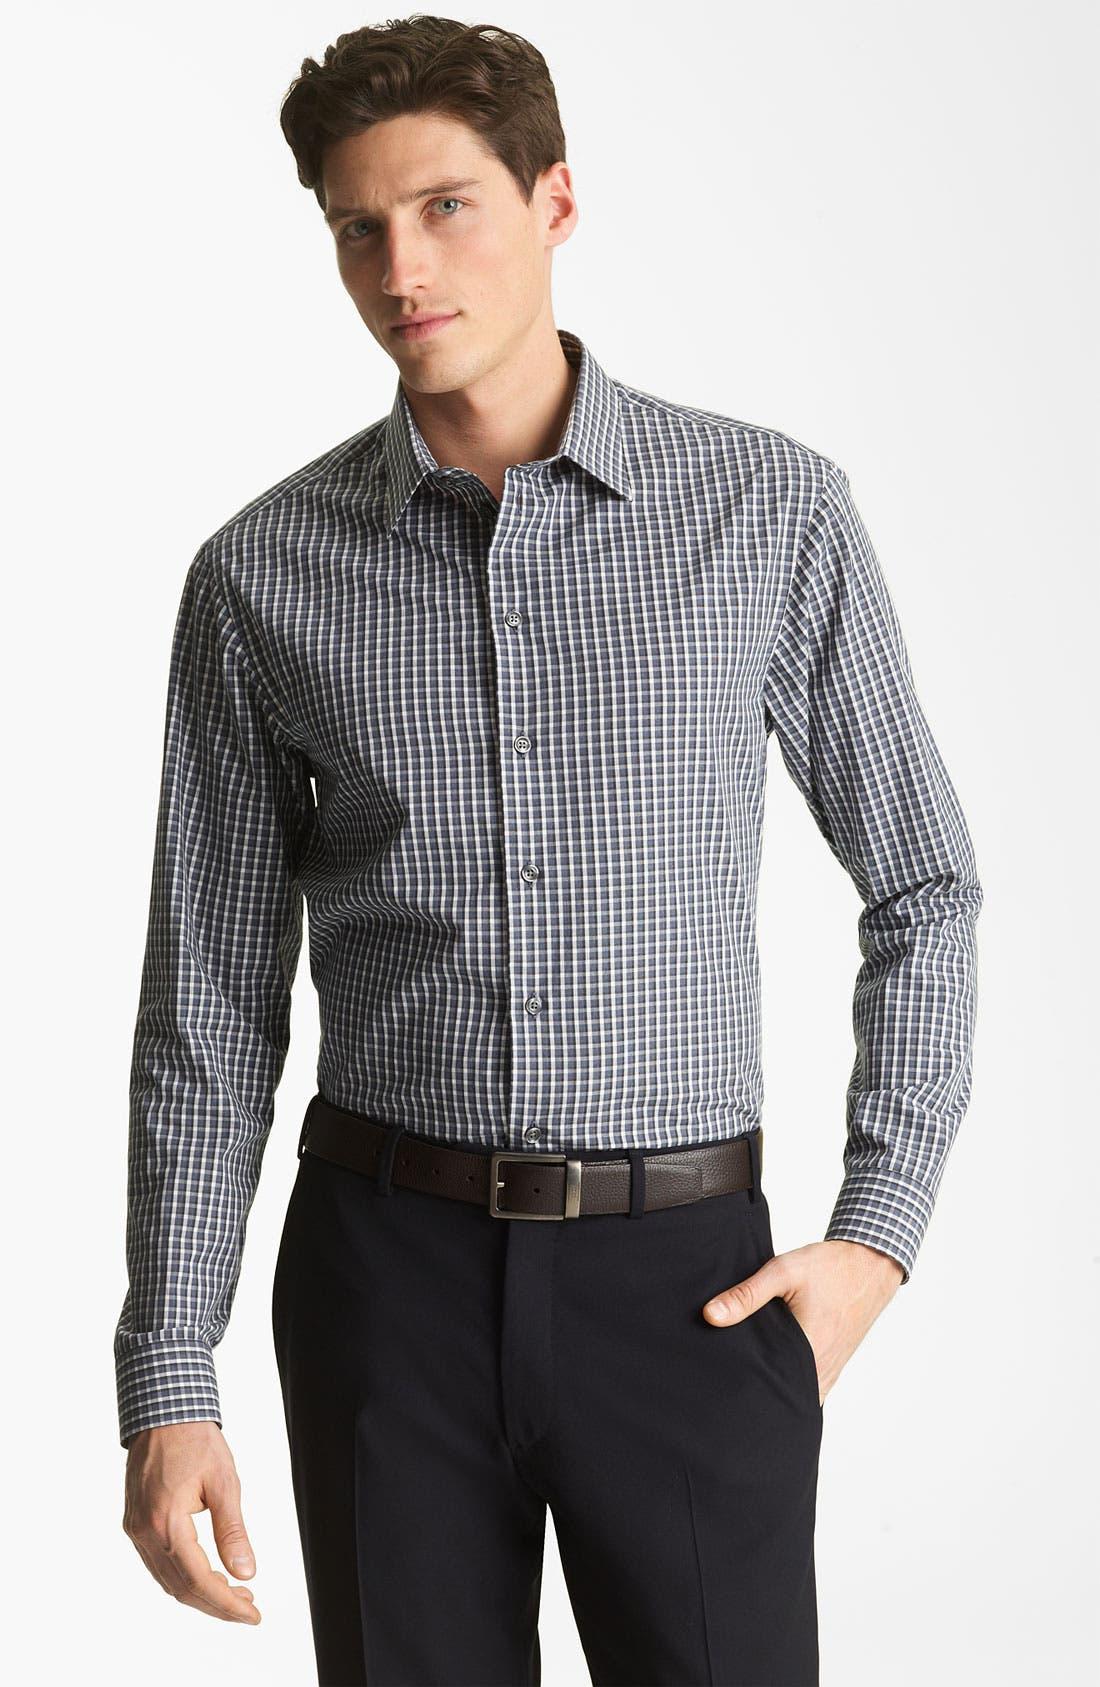 Alternate Image 1 Selected - Armani Collezioni Check Plaid Sport Shirt